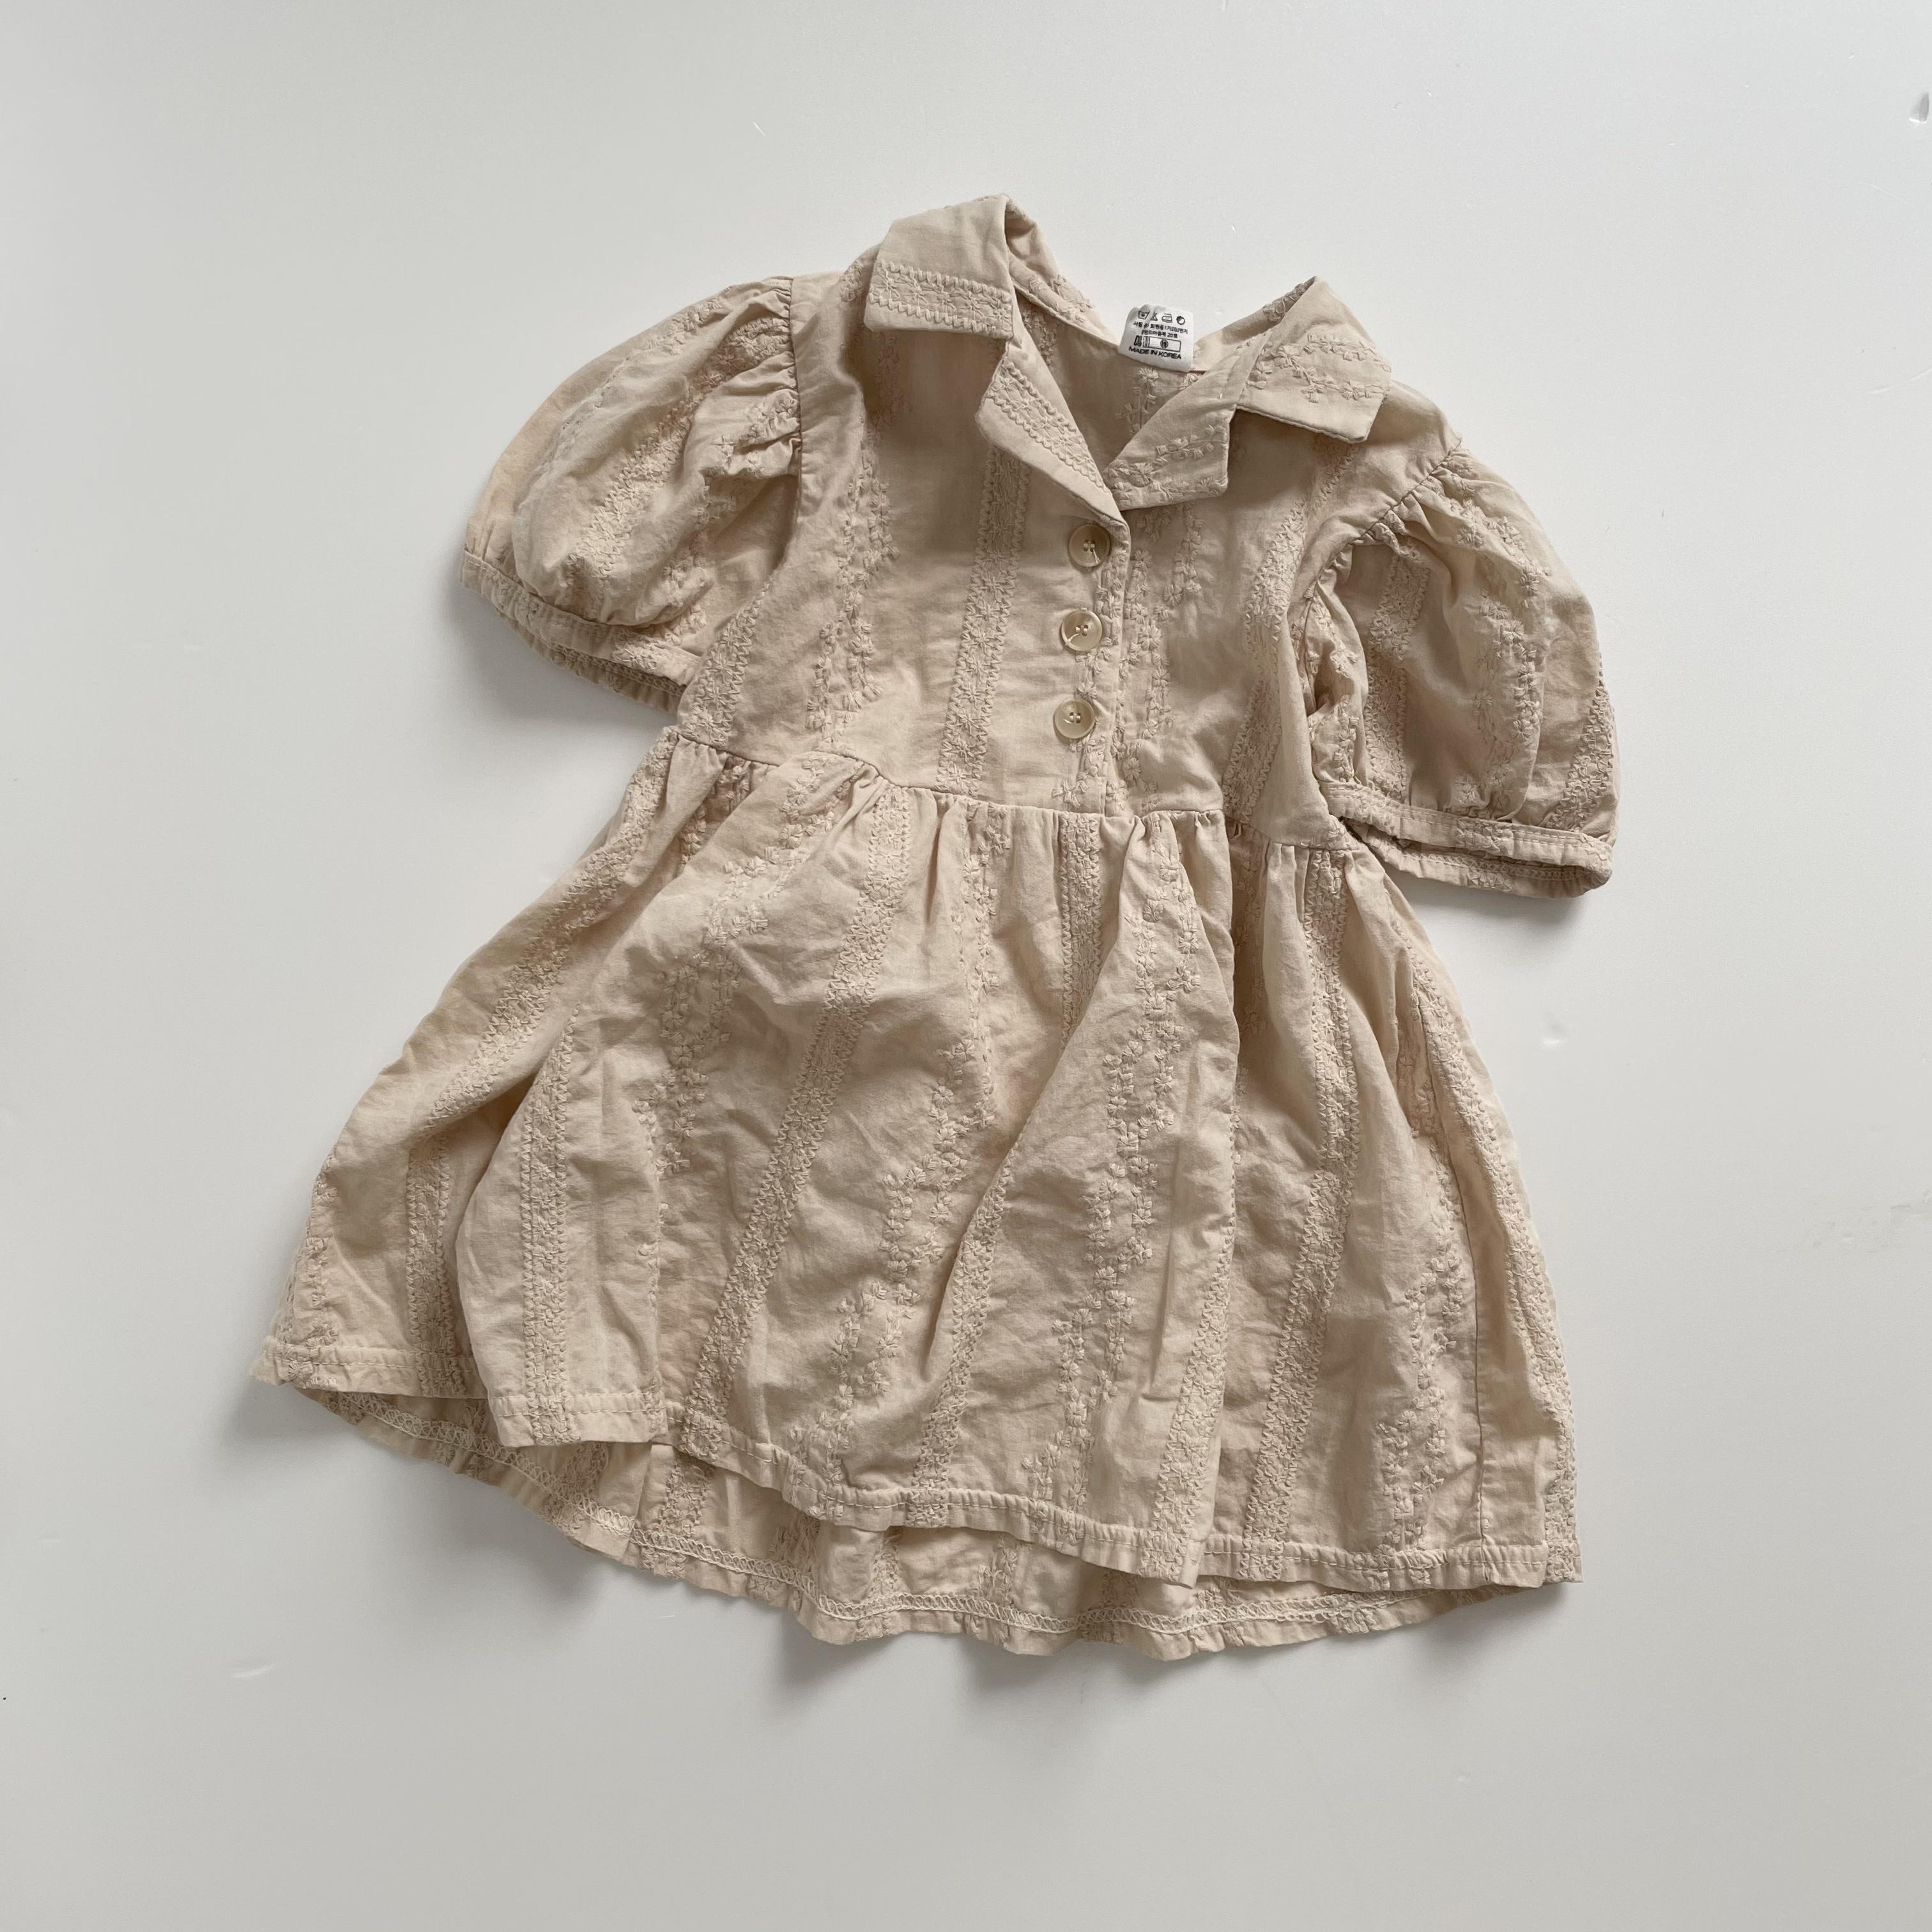 NO.1351. Jasu one-piece